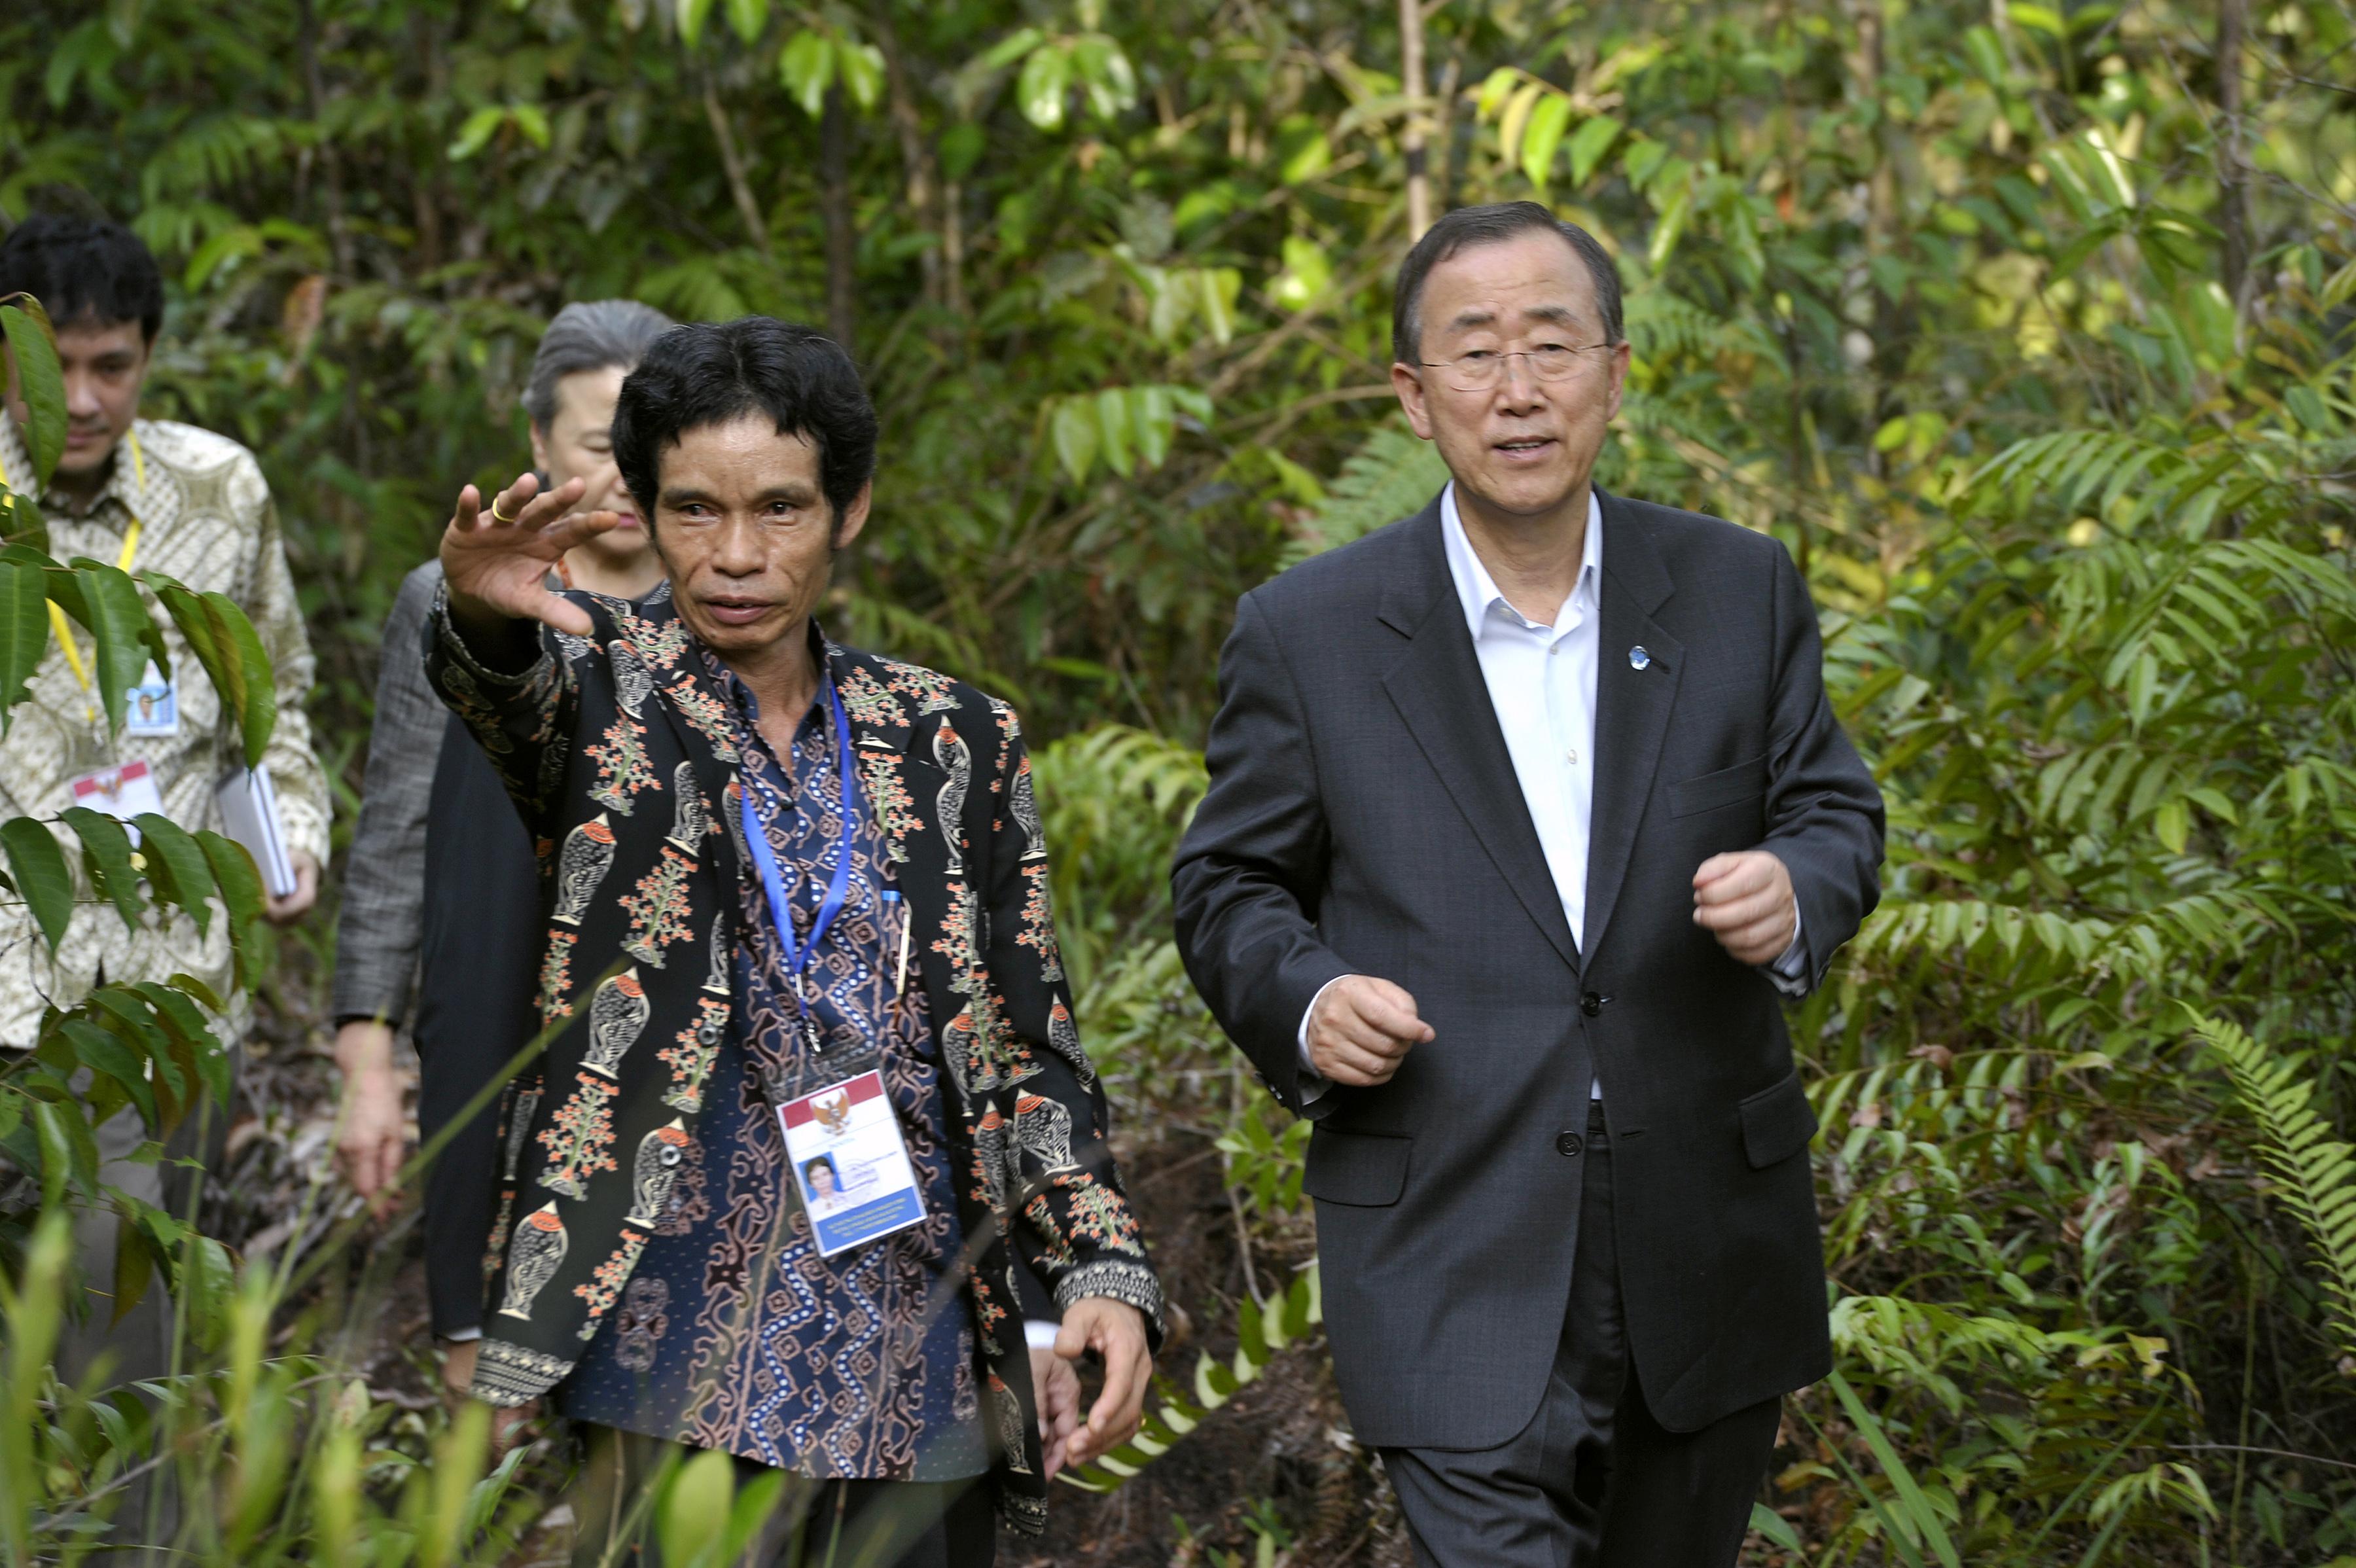 ban ki moon-deforestation-REDD+-SG-UNORCID-Palangkaraya, CENTRAL KALIMANTAN, indonesia